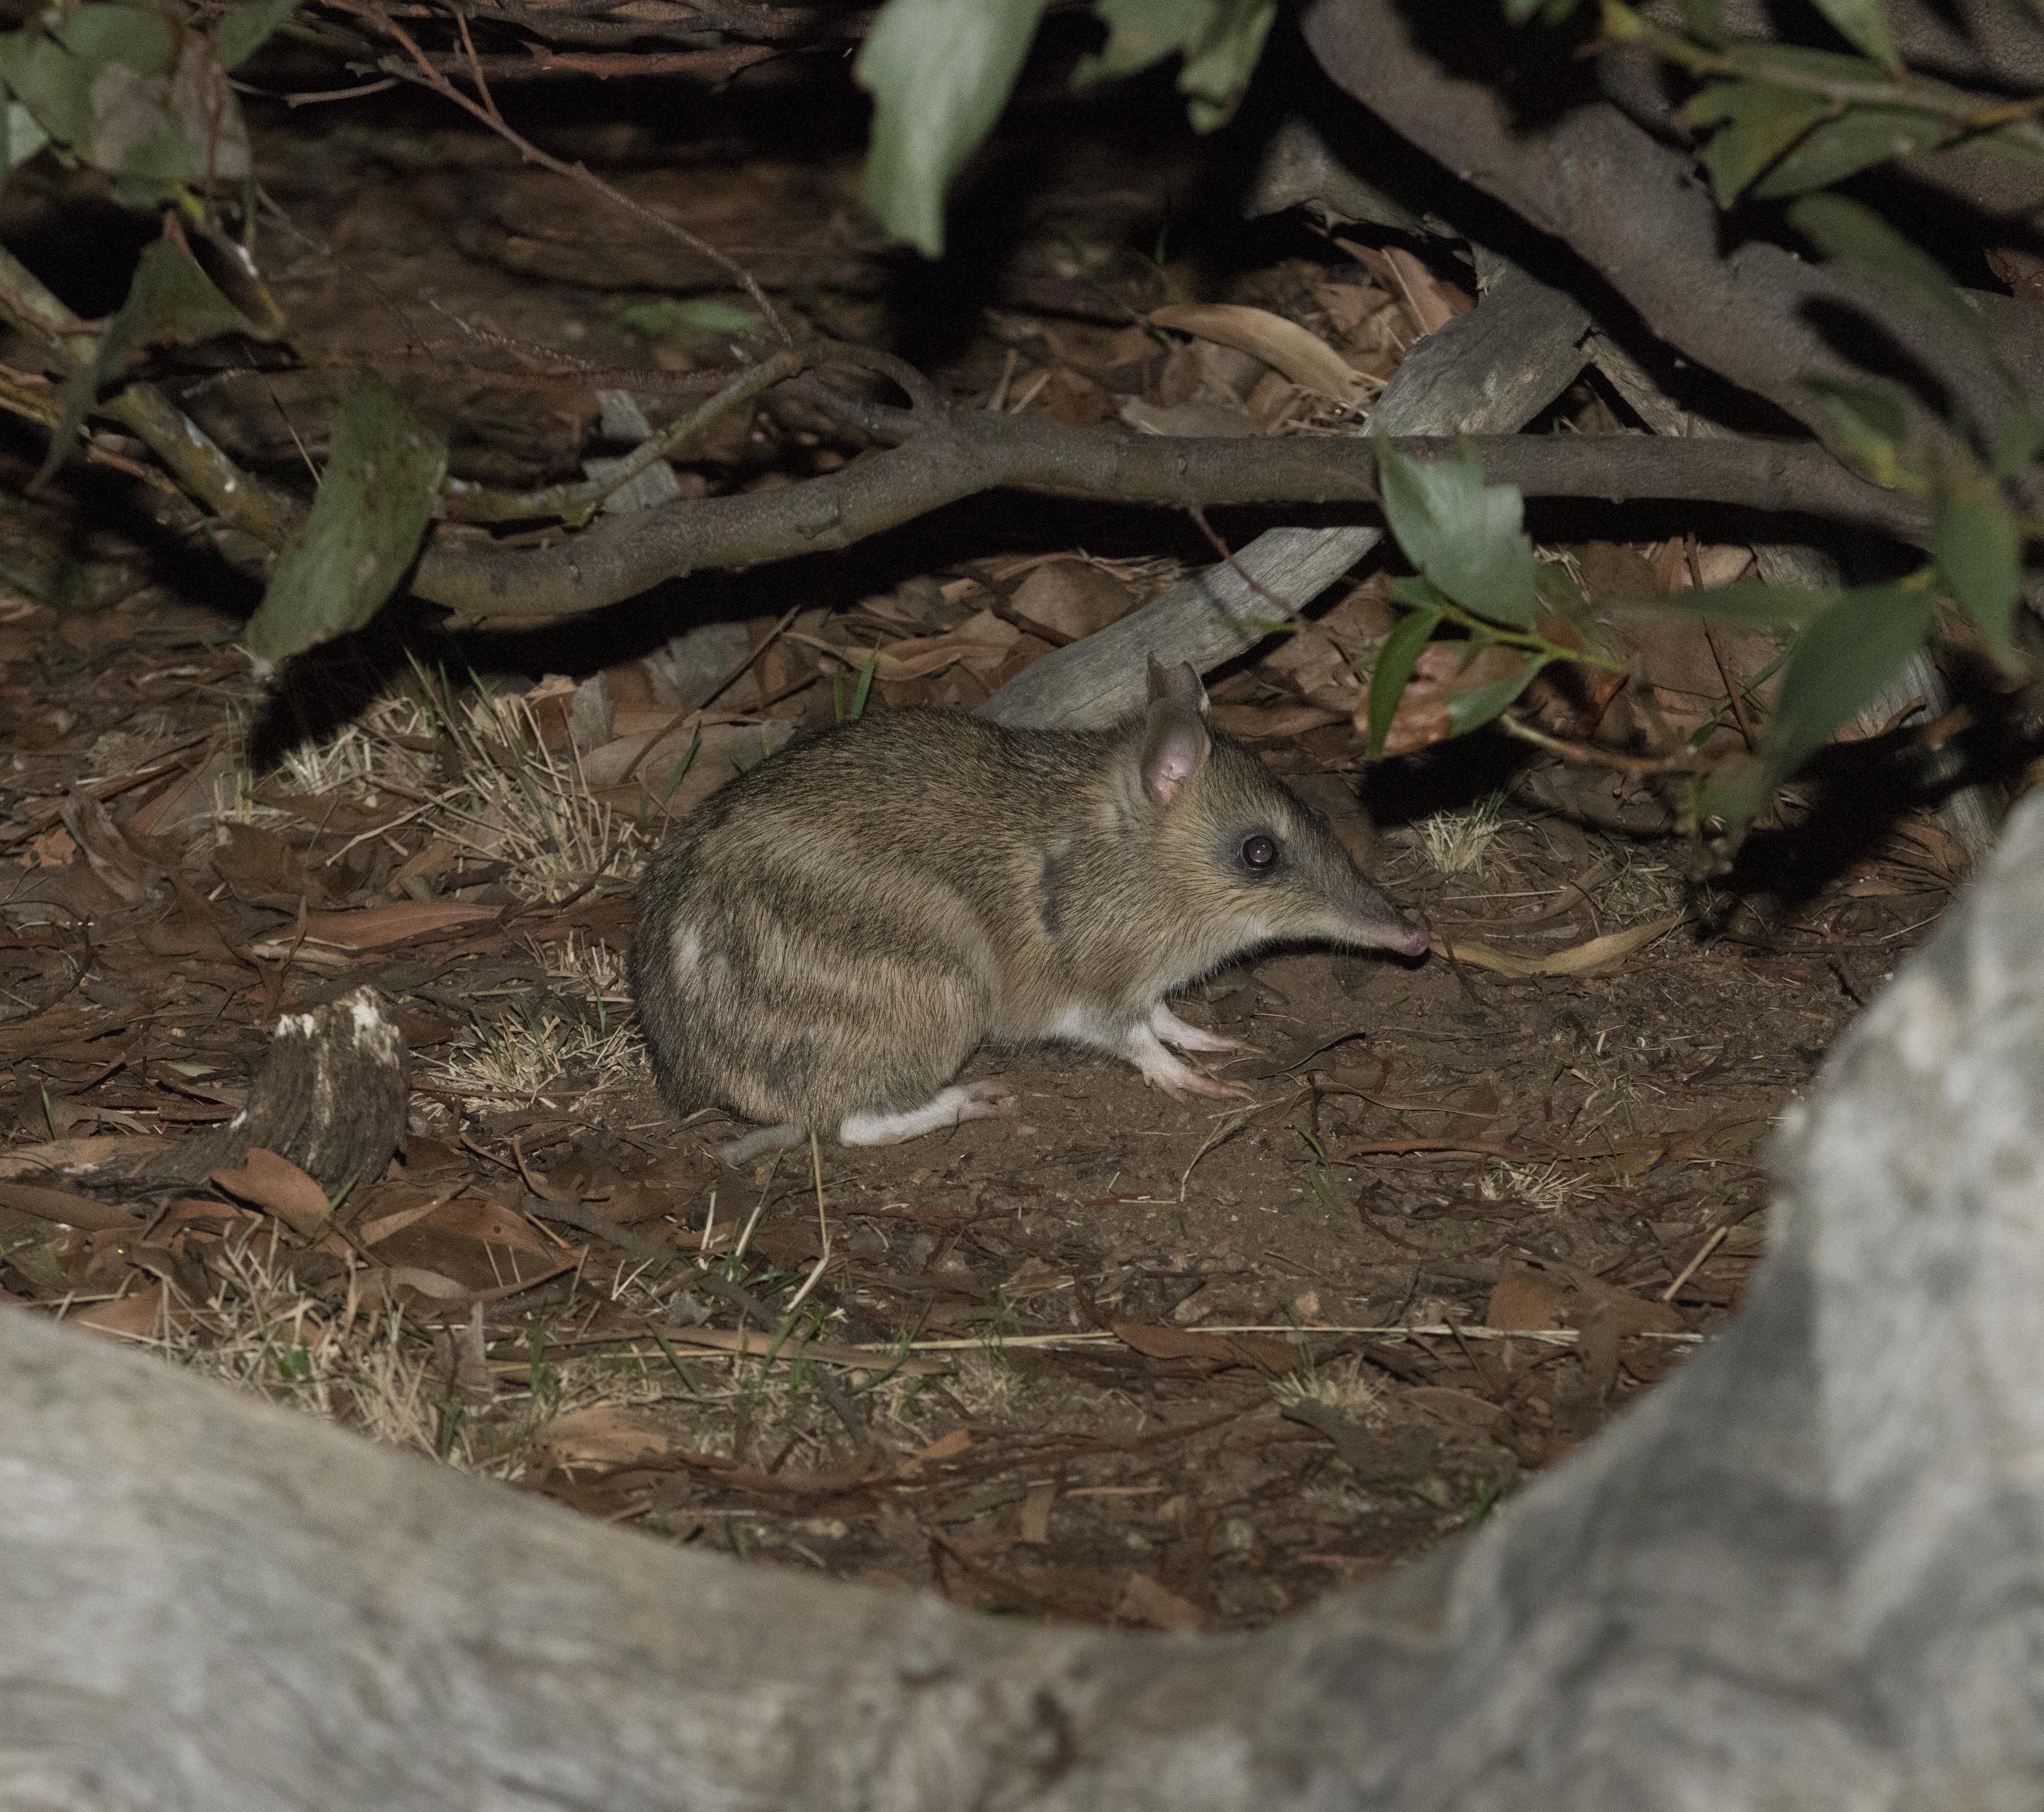 Image of Eastern Barred Bandicoot